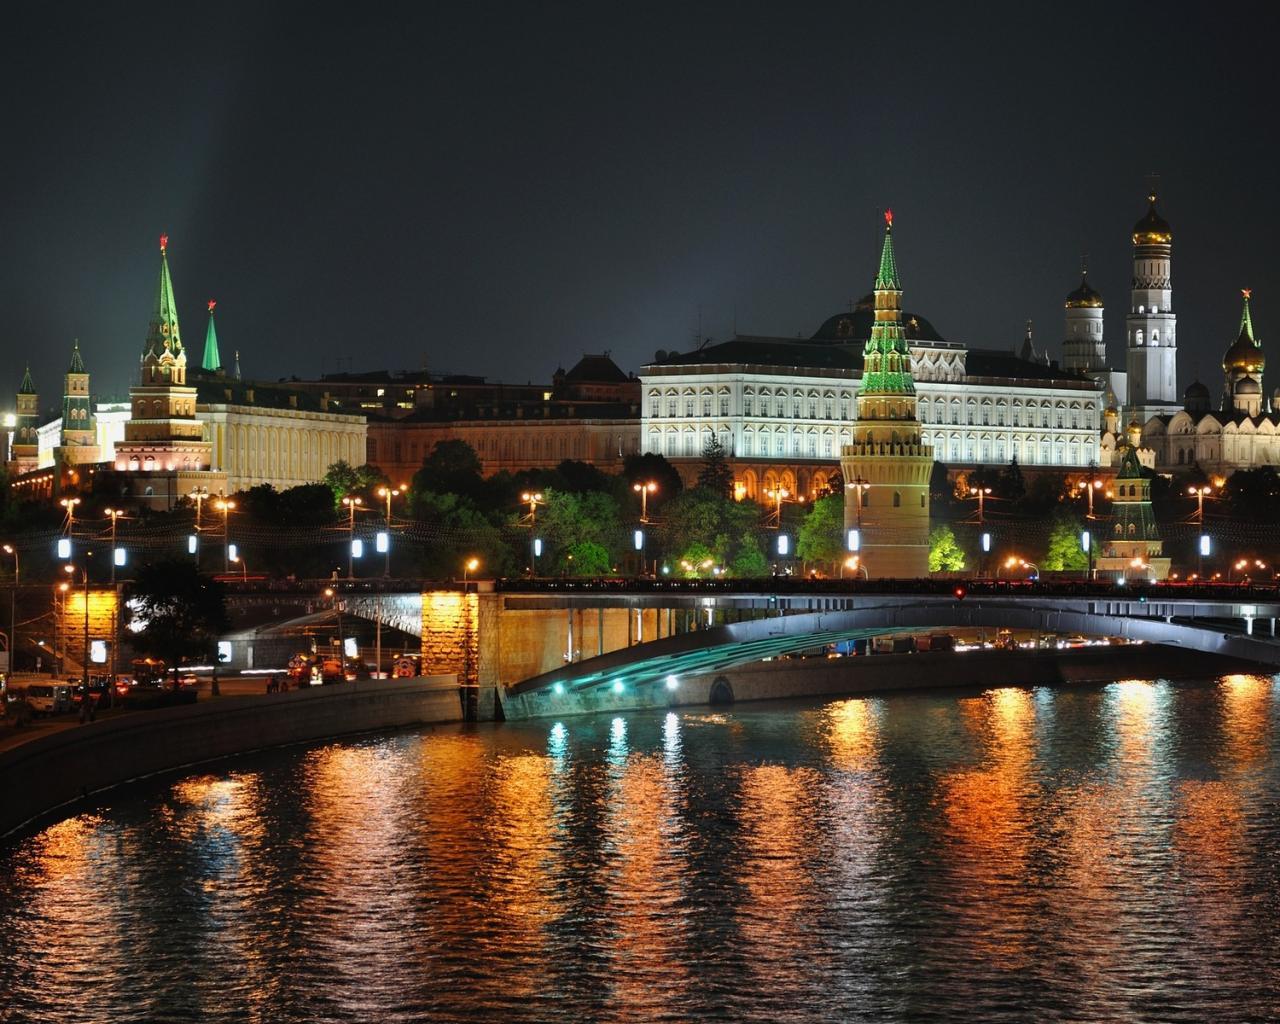 Ночная Москва обои для рабочего стола, картинки, фото ...: http://hq-wallpapers.ru/wallpapers/city/pic14144_raz1280x1024